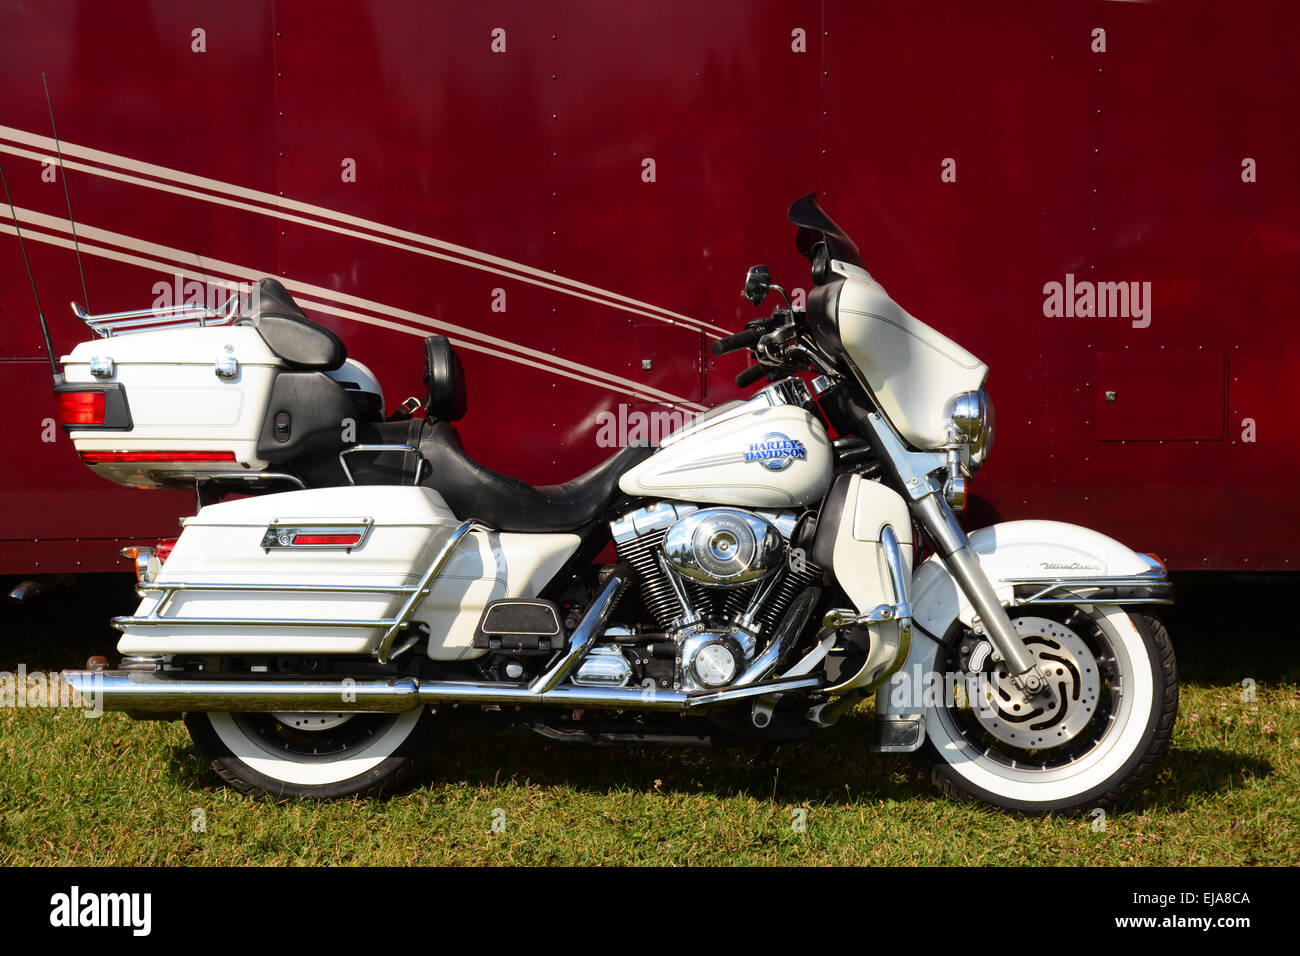 Harley Davidson motorcycle - Stock Image